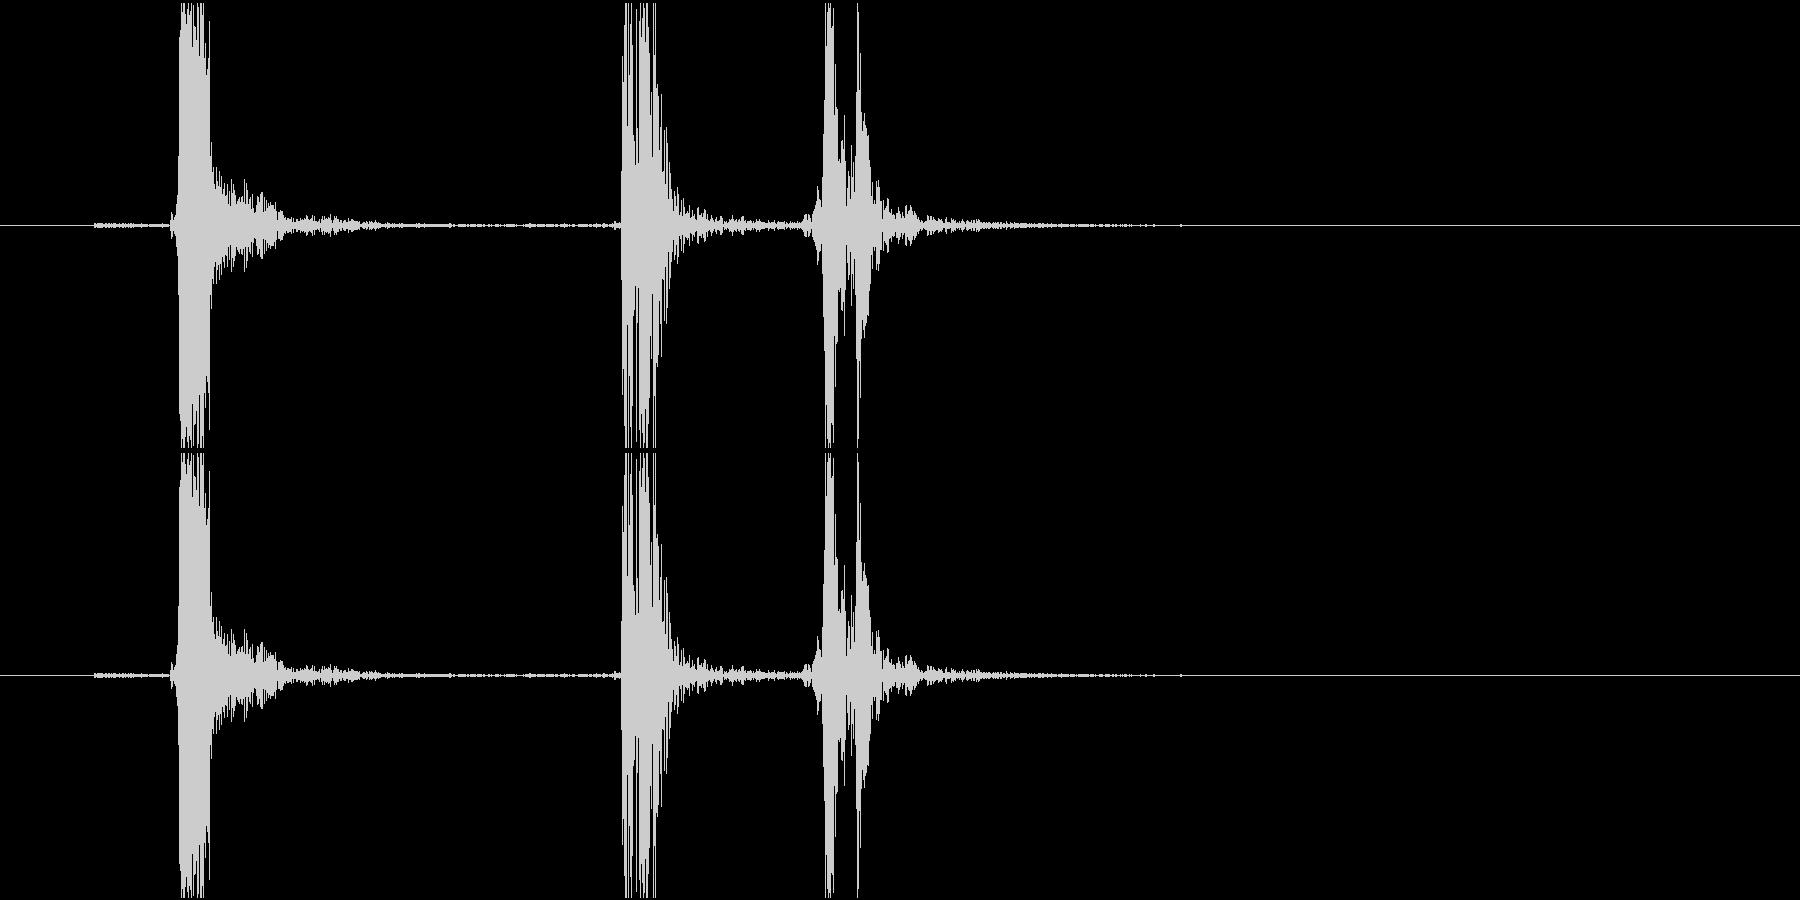 Typing キーボード 連打音の未再生の波形